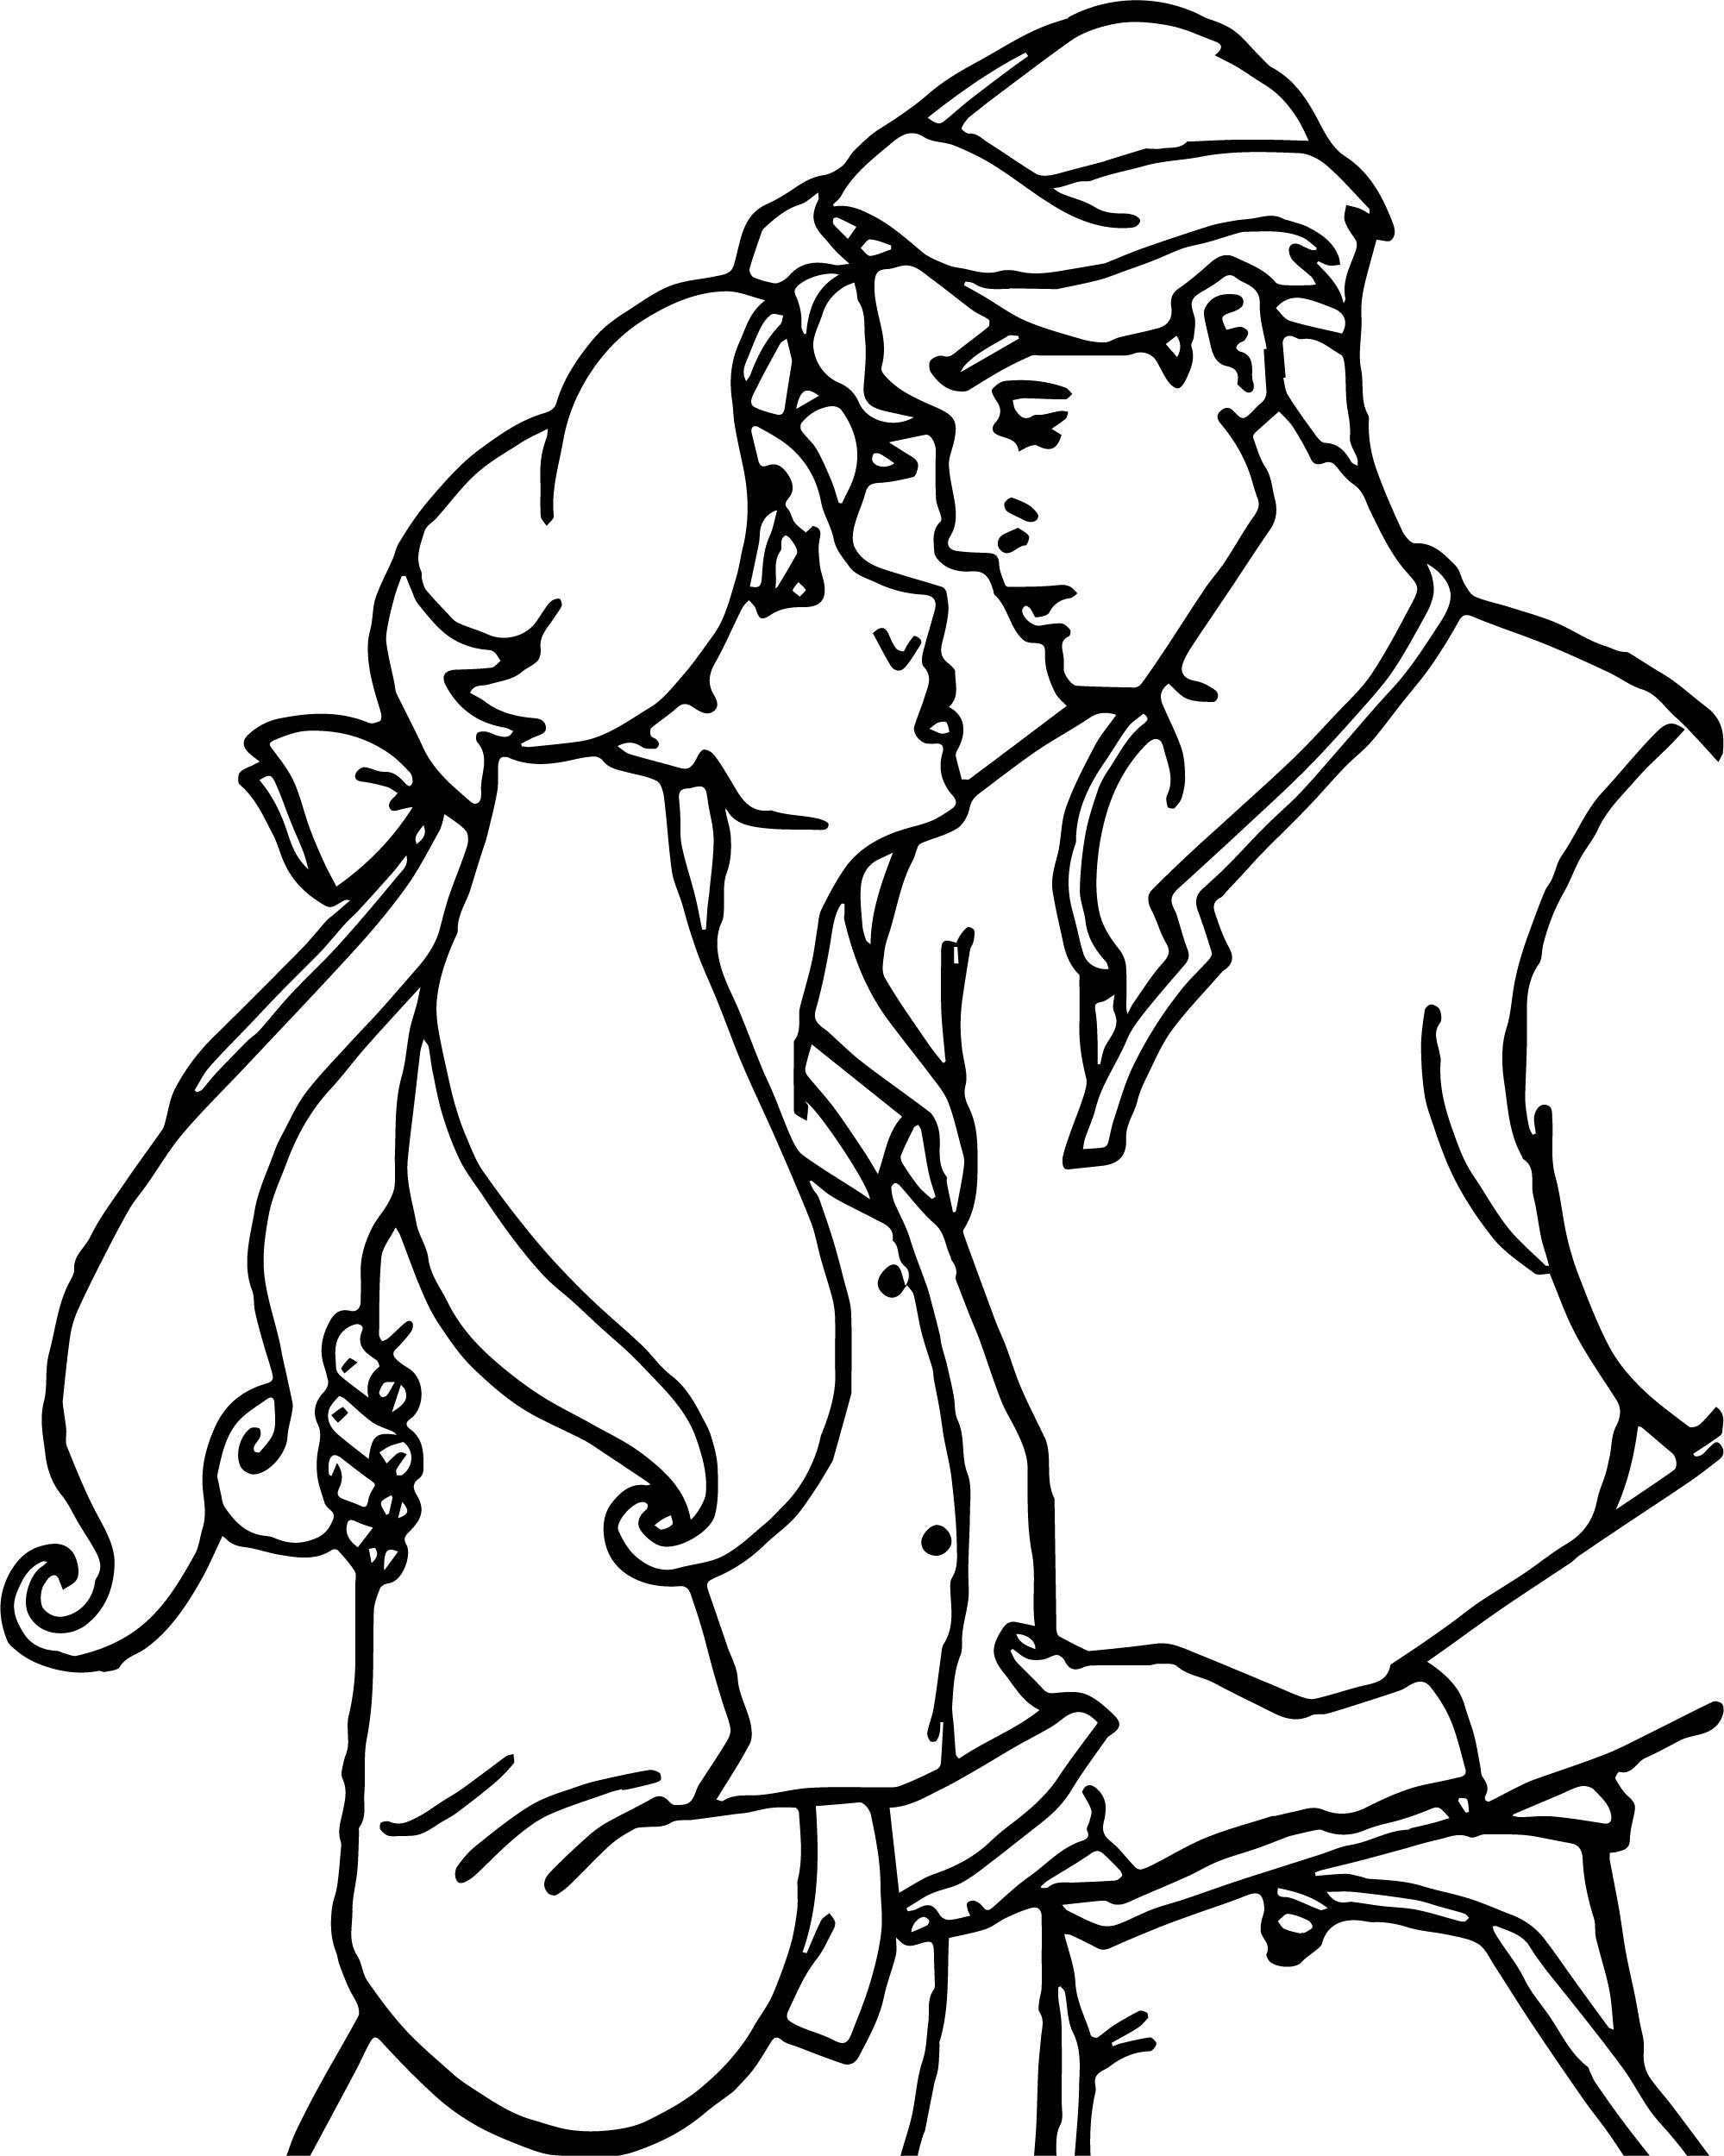 Anastasia Love Image Coloring Page